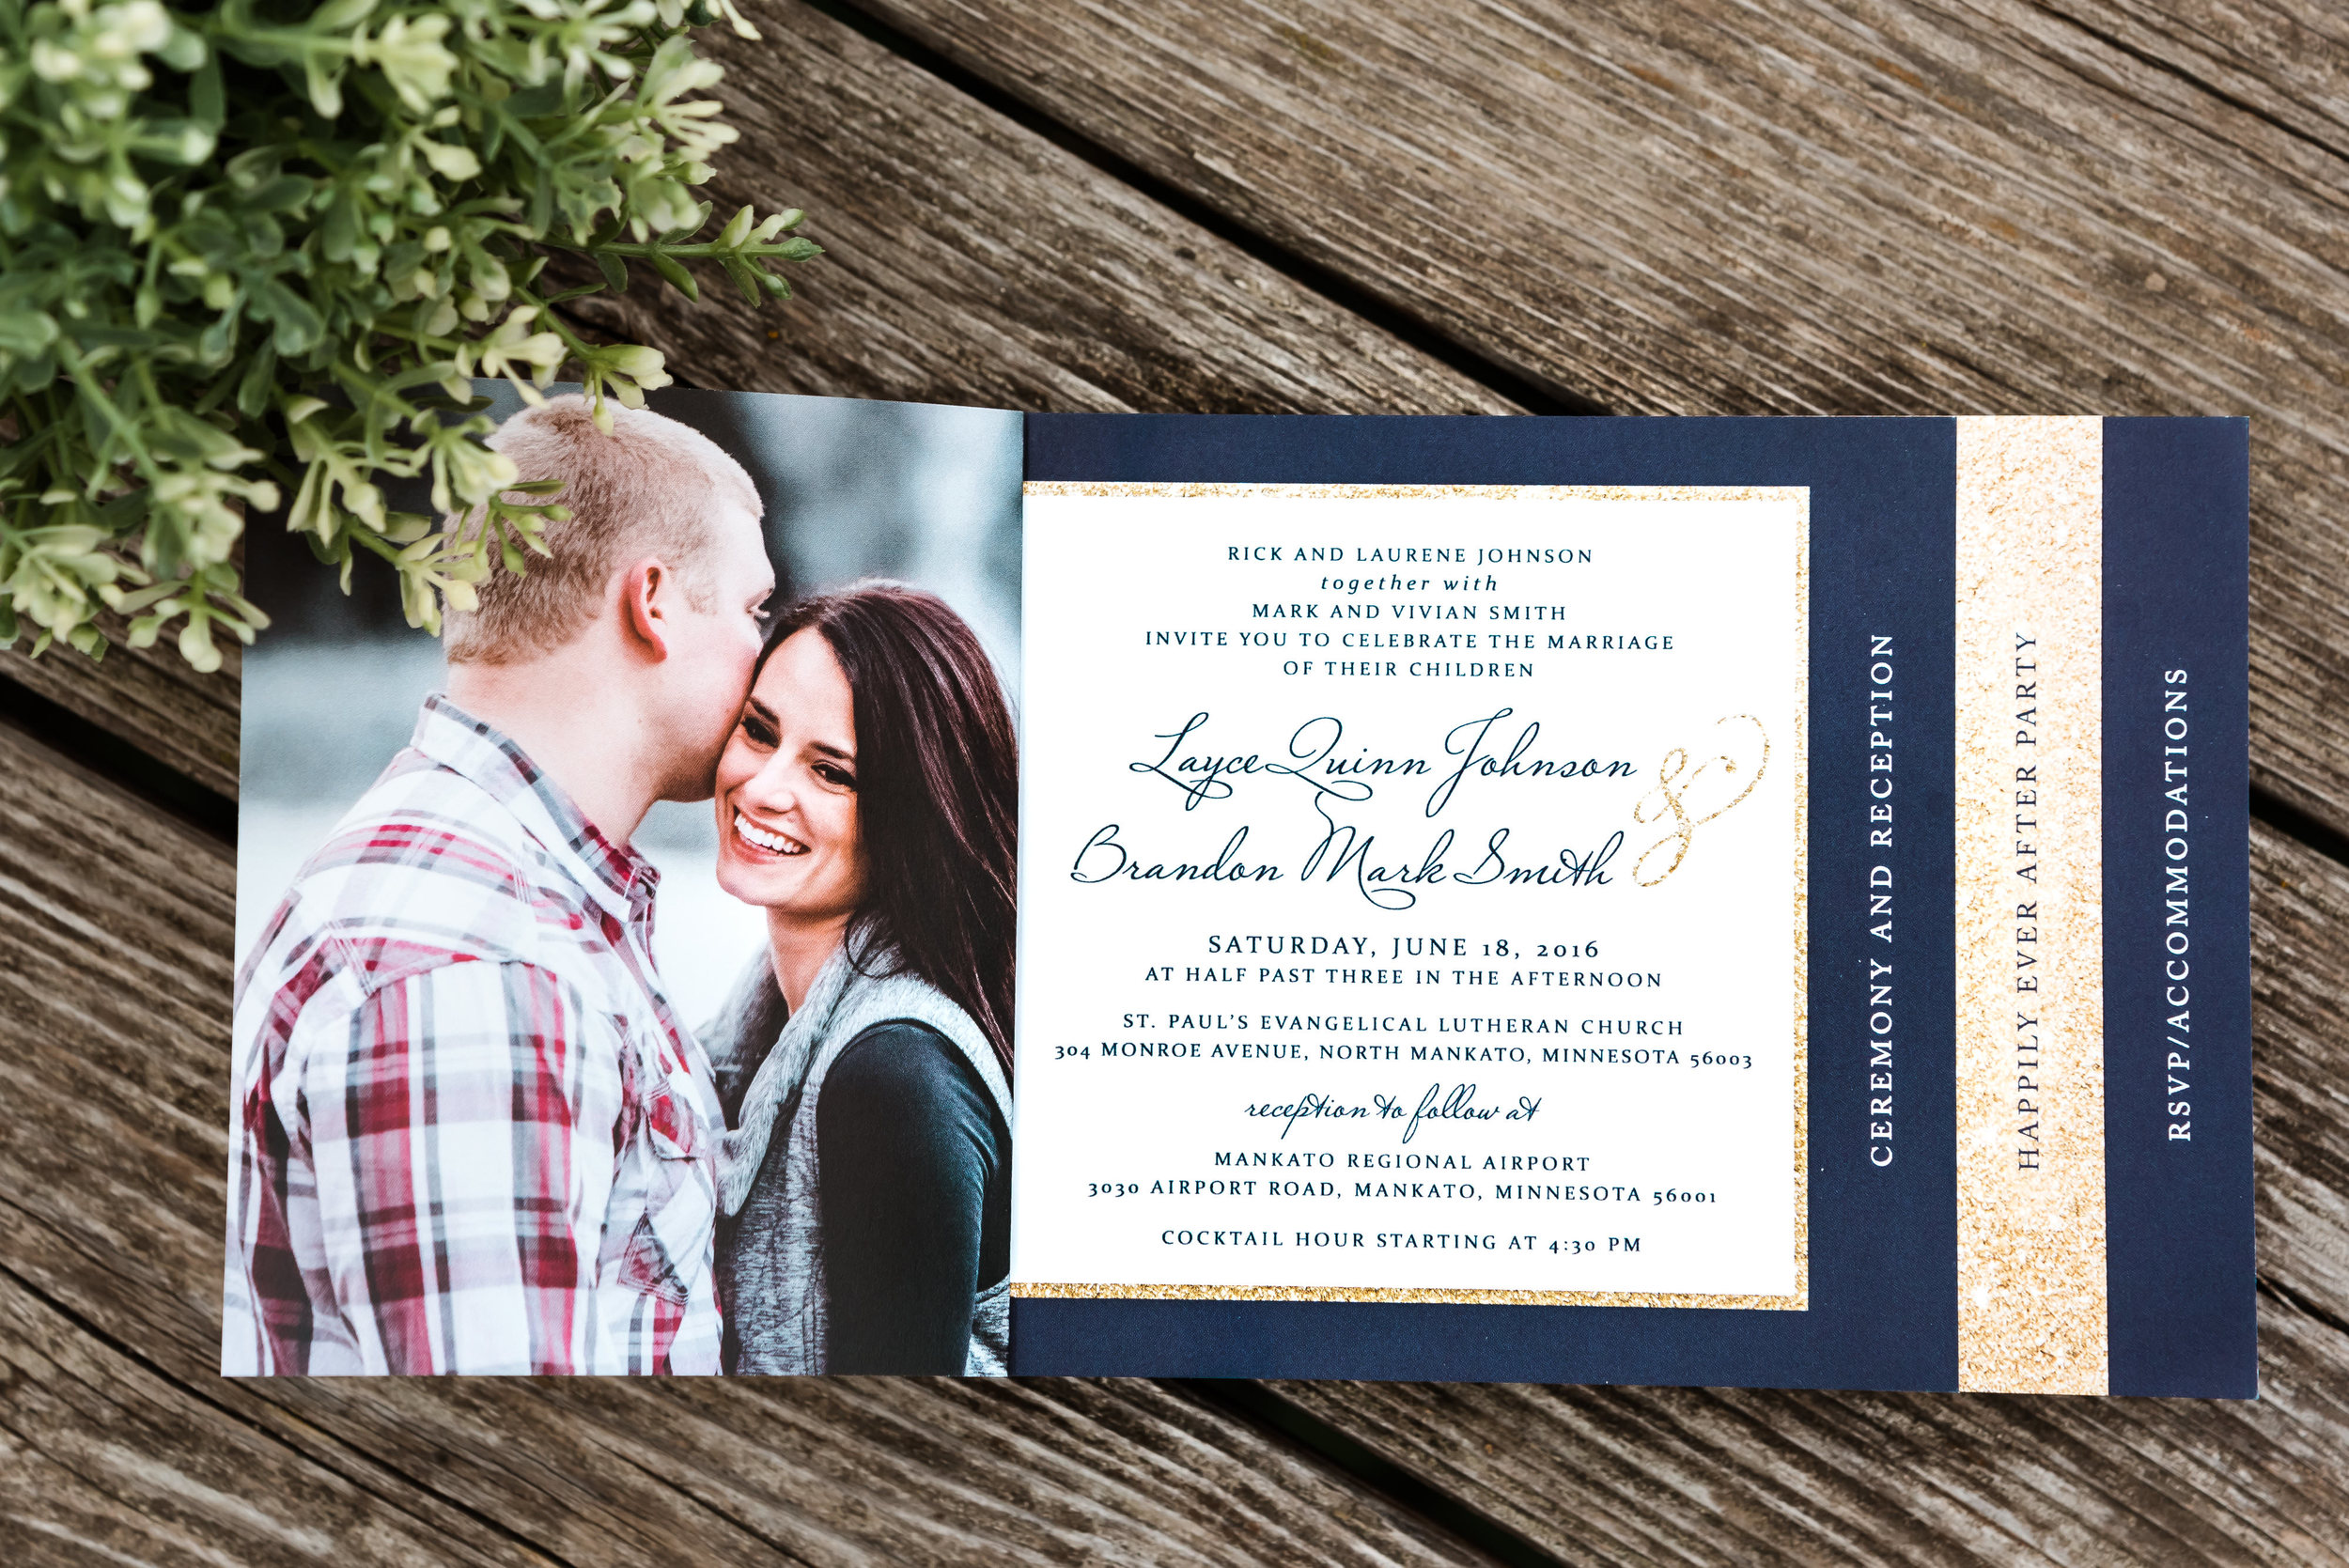 Layce and Brandon - Wedding - Invitation Suite-4.jpg